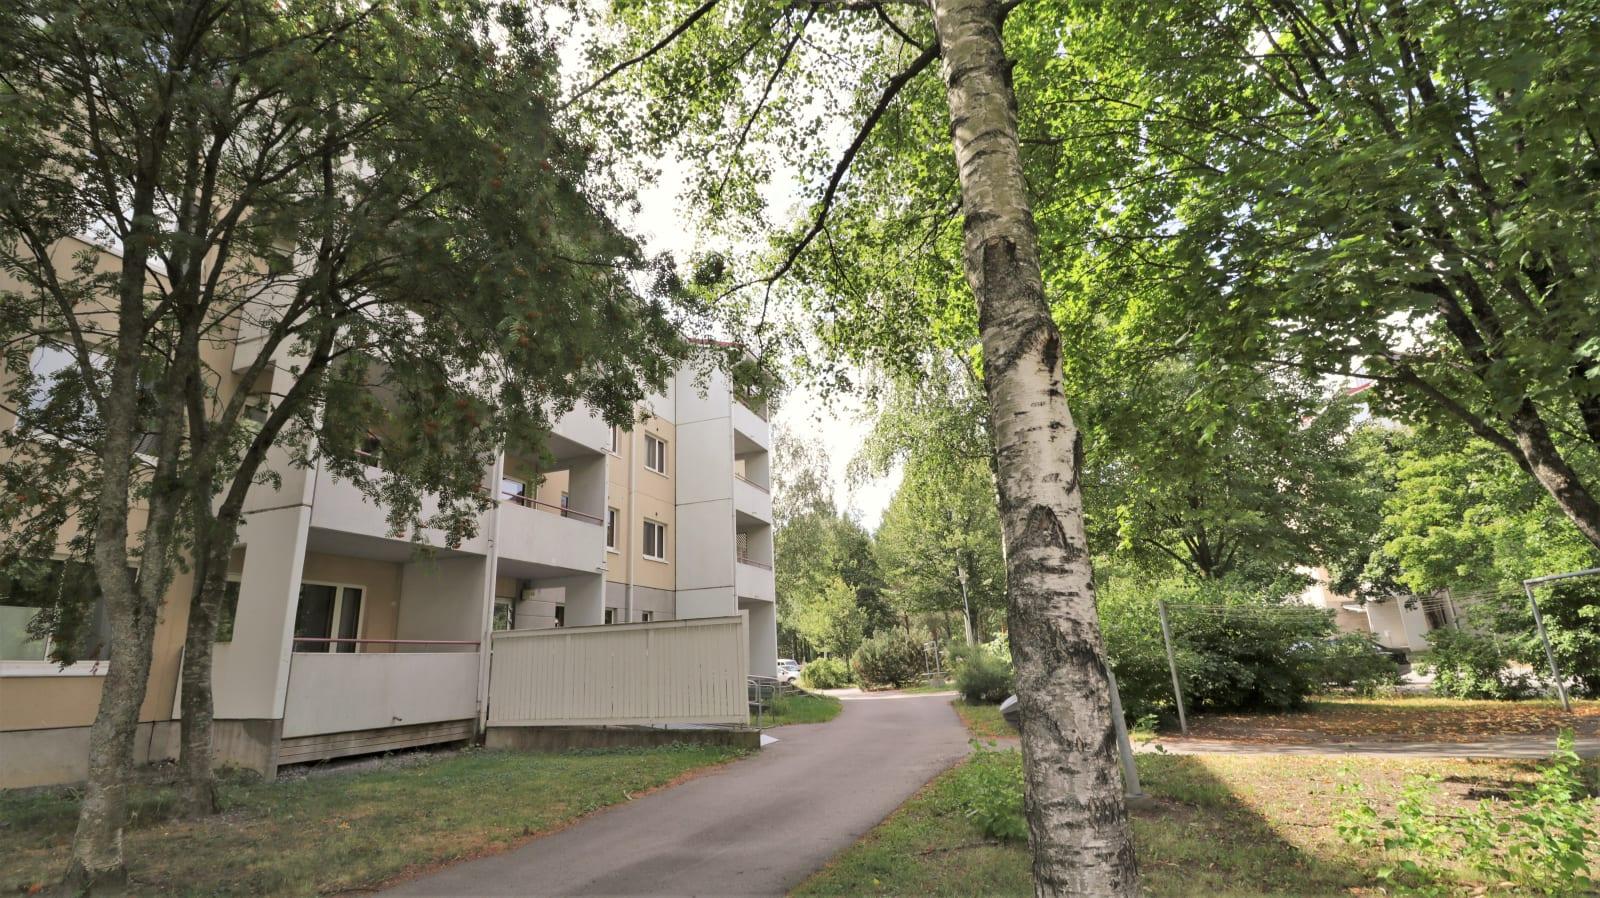 Turku, Pansio, Metallikatu 13, Ruotsinsalmenkatu 2